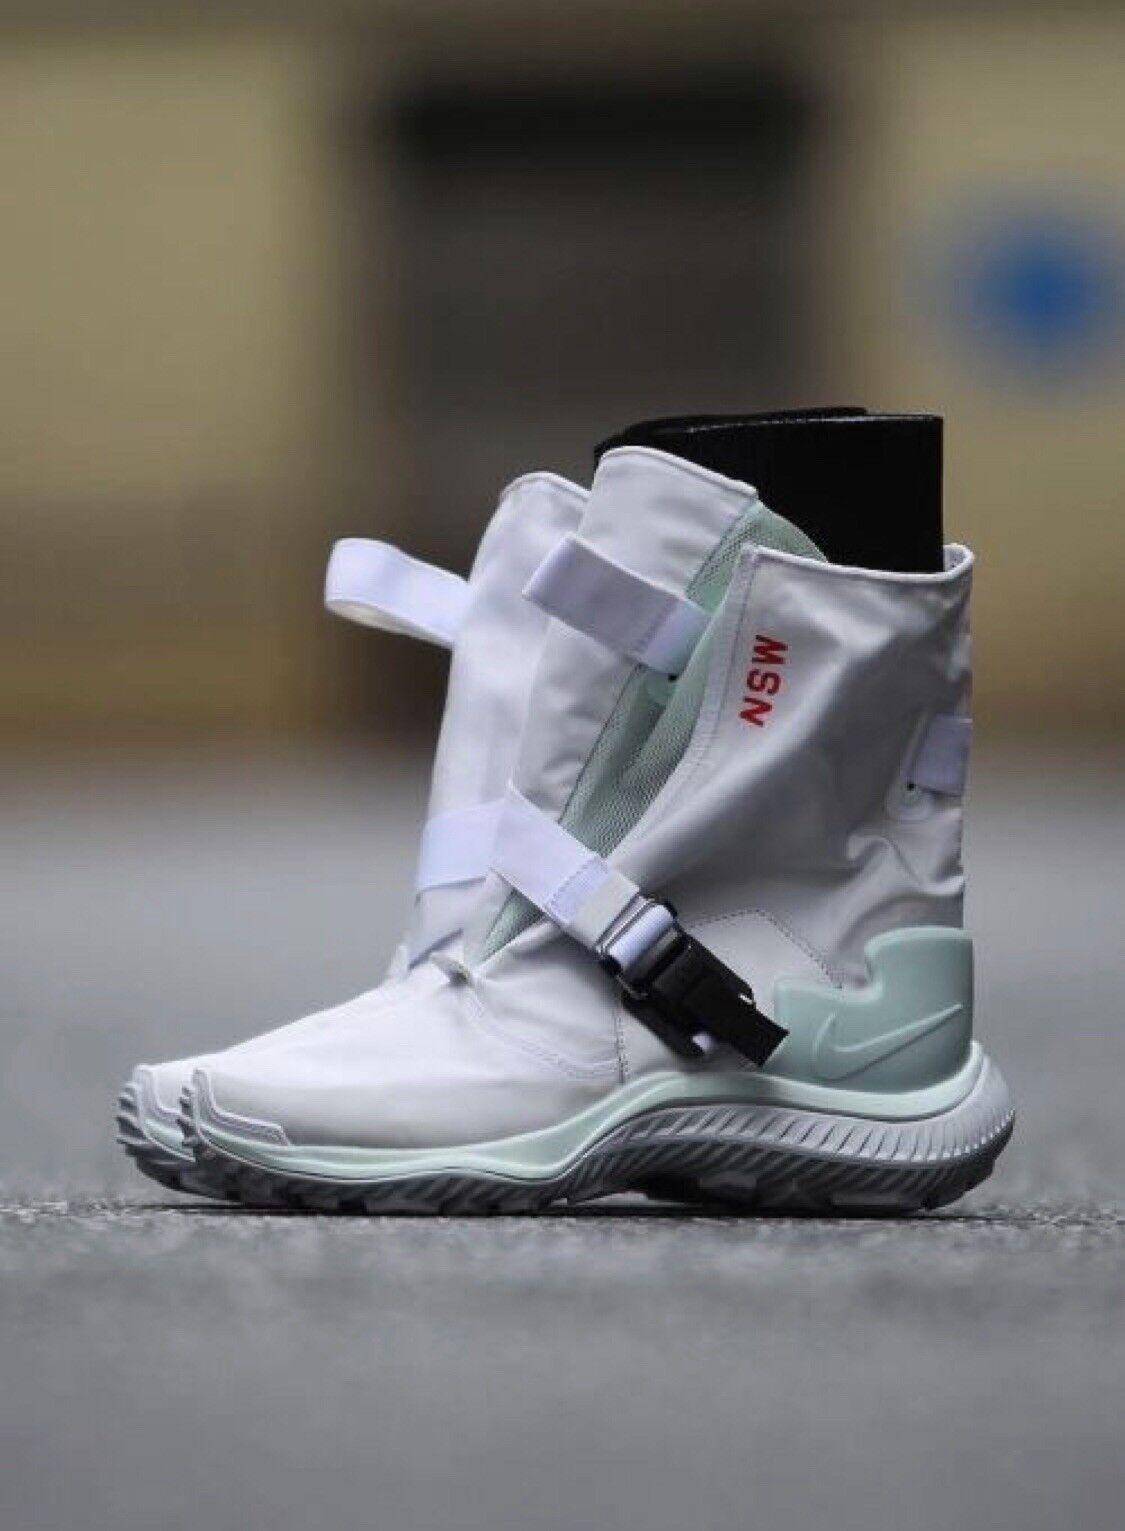 NikeLab Donna Winter Stivali Gyakusou Gaiter  White (US 7.5)